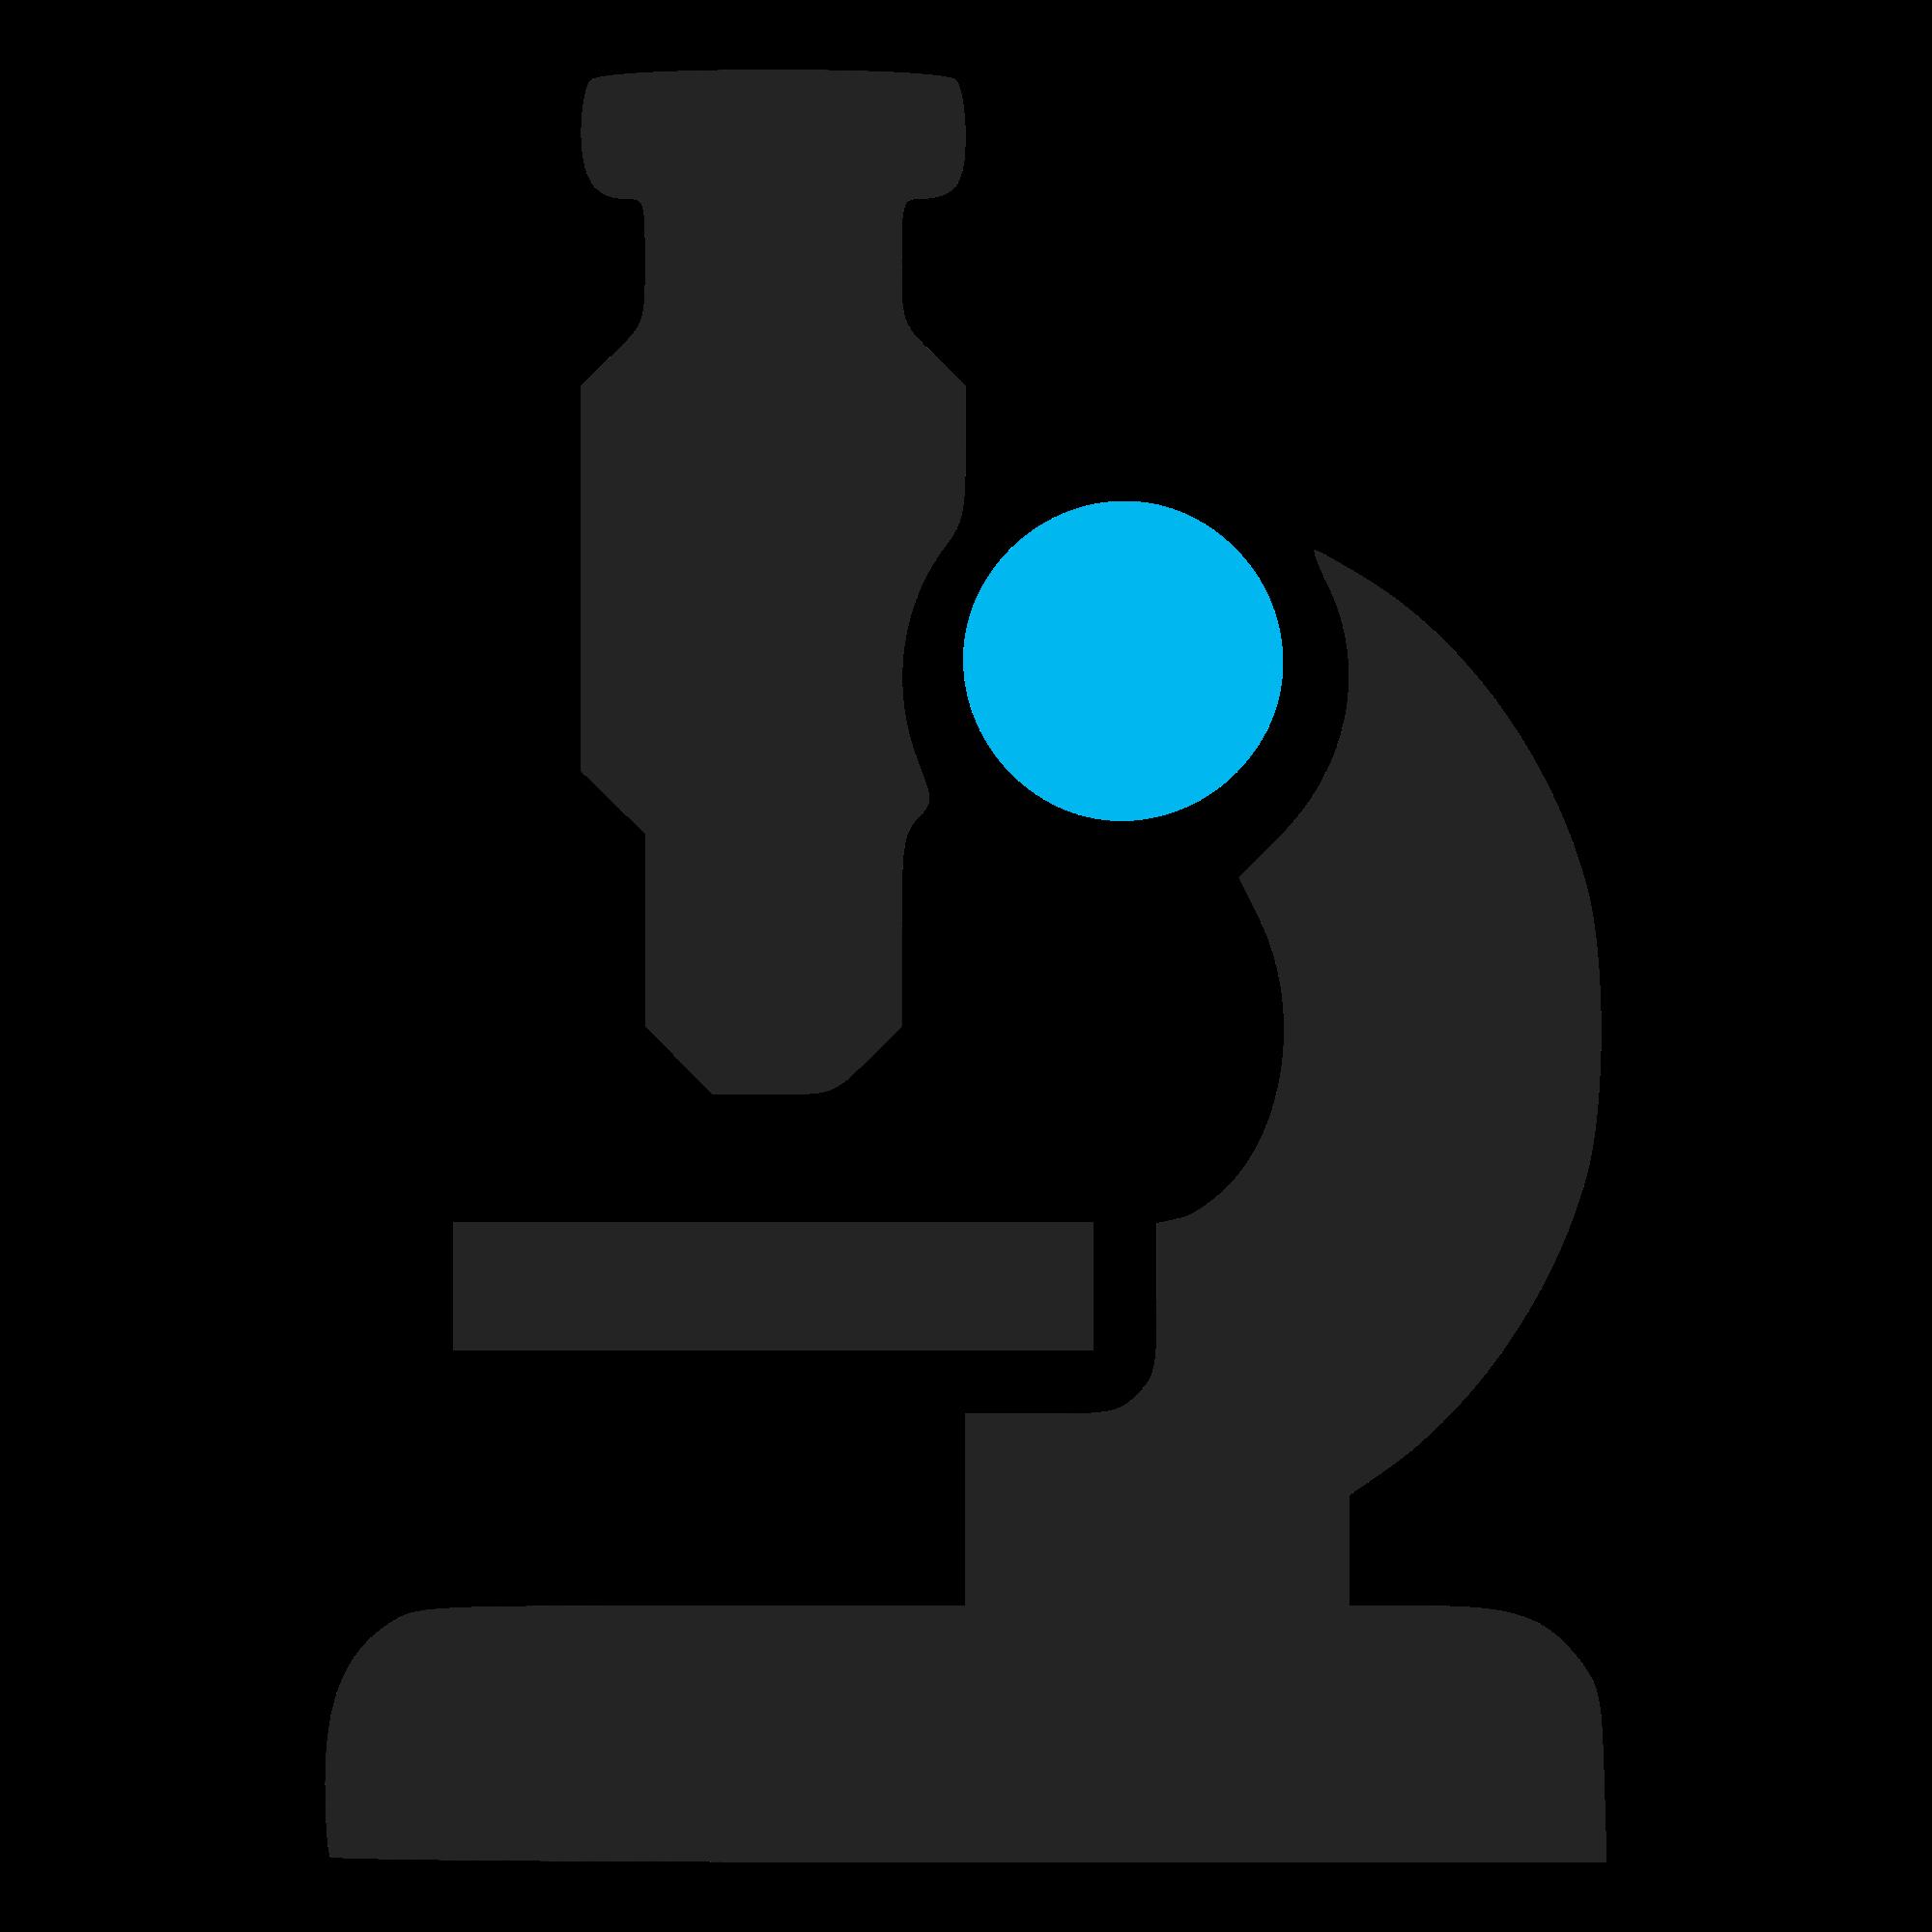 2000x2000 Dominio Icono Microscopio Multimedia Para El Rea